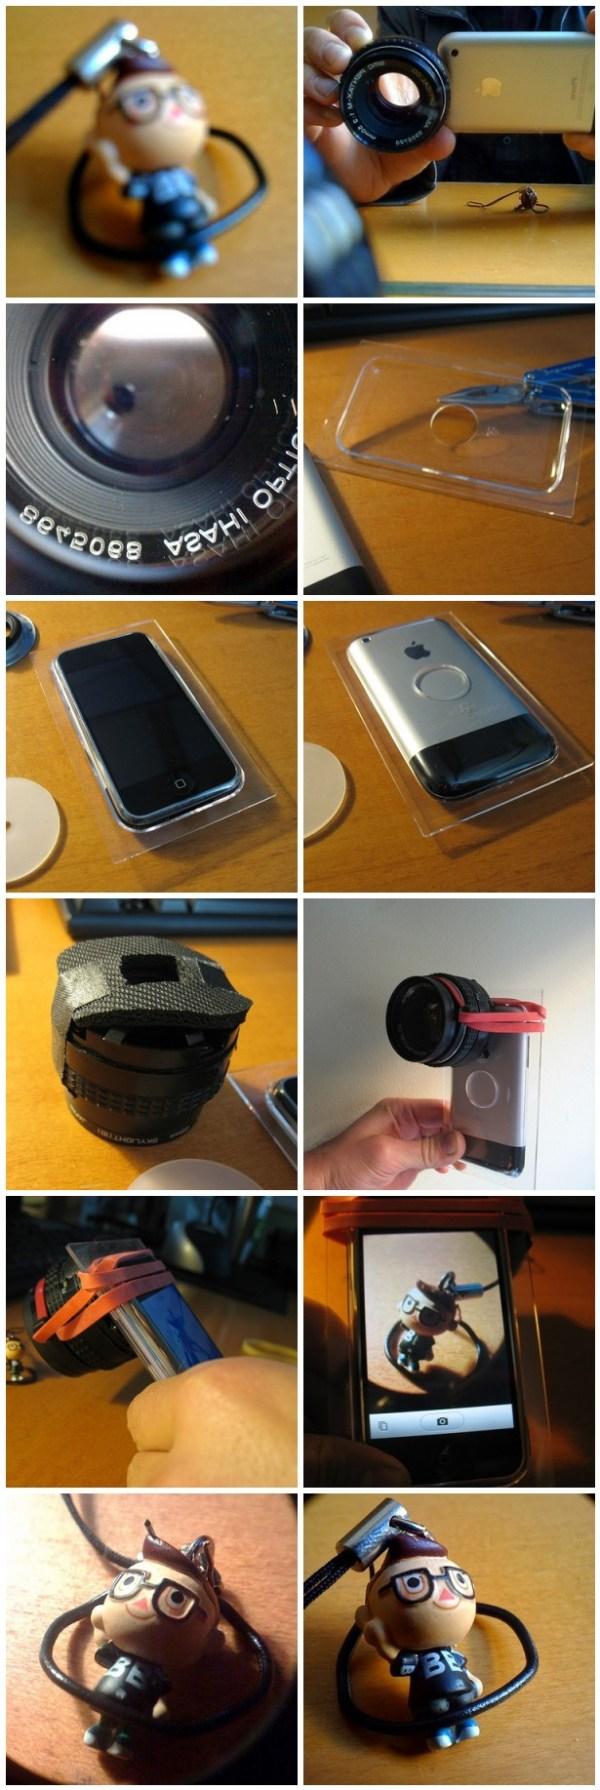 macroPhoneMosaic.jpg